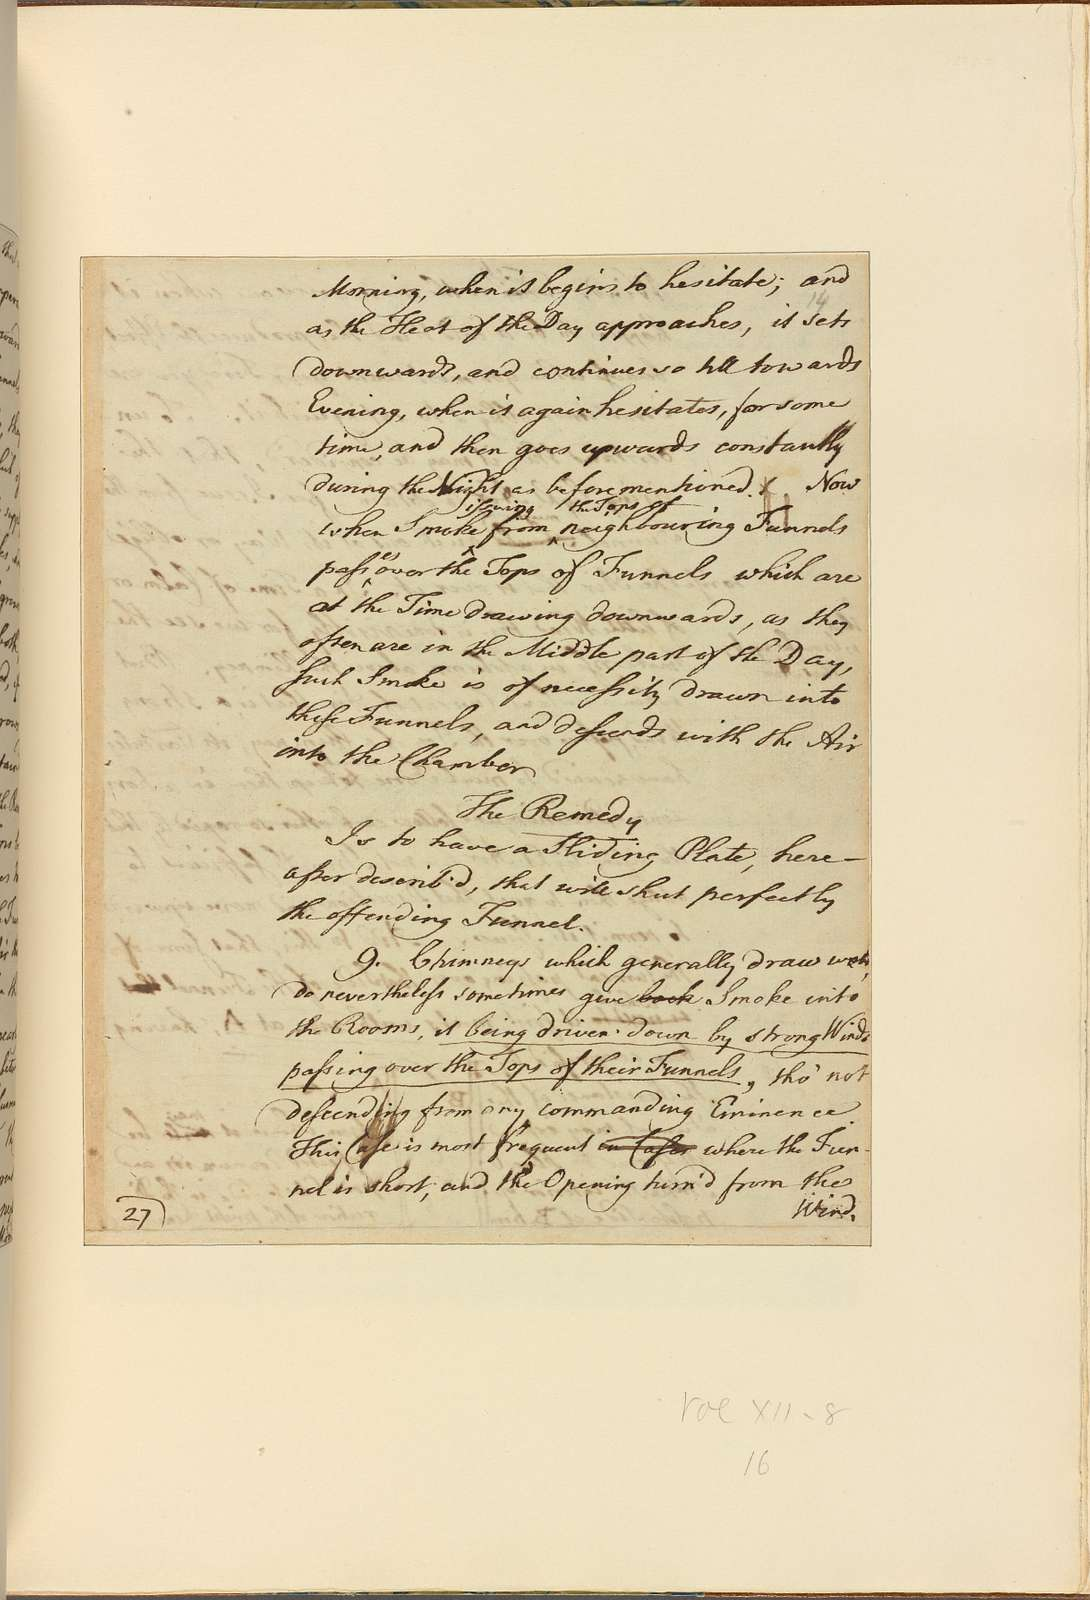 Letters on Smoky Chimneys. 1762–1785. Thos. Addis Emmet M.D.